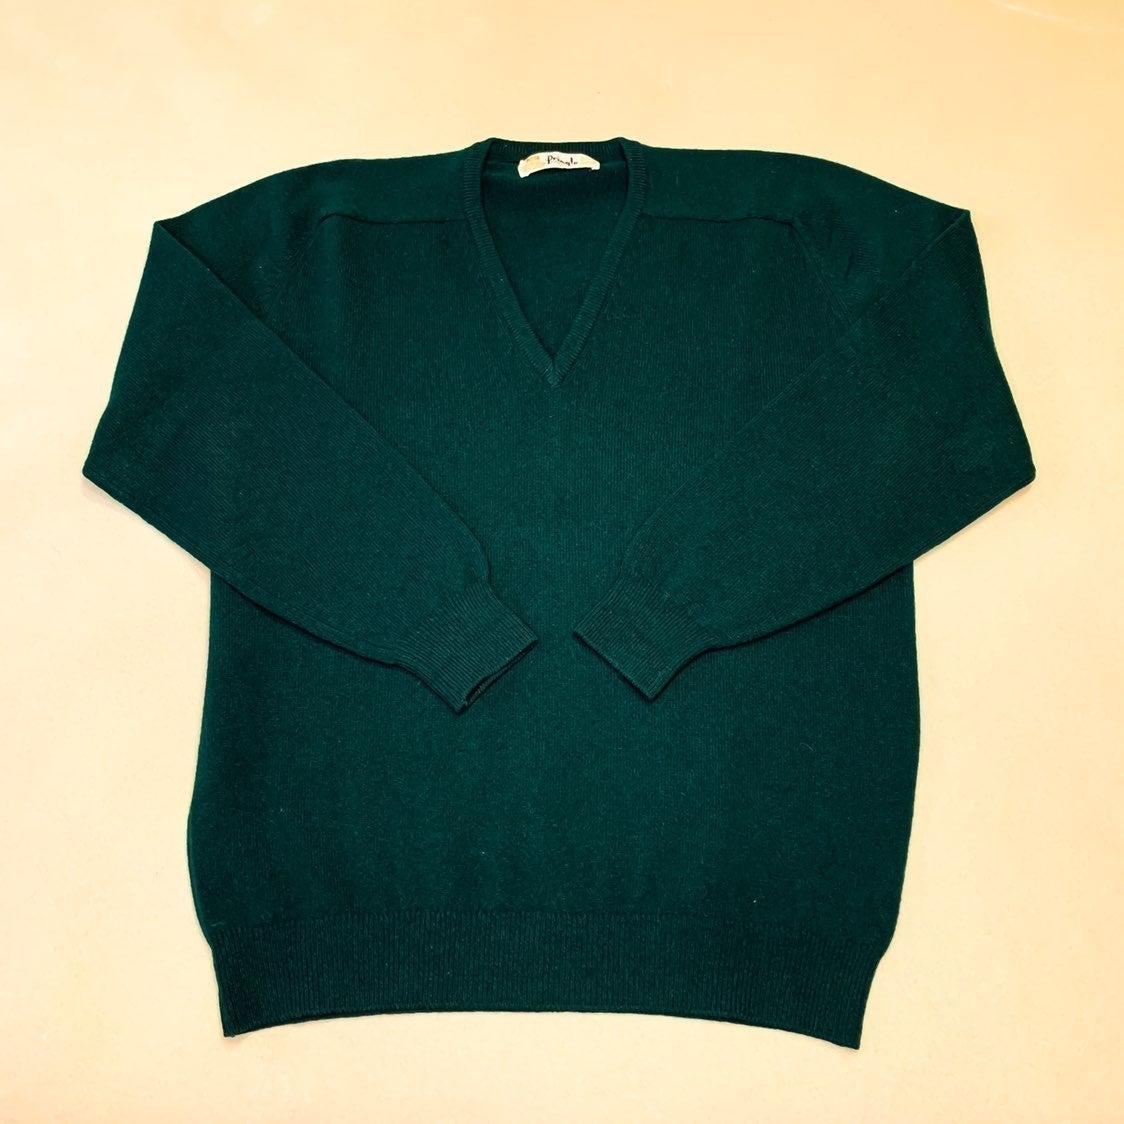 Vintage Pringle lambswool v-neck sweater